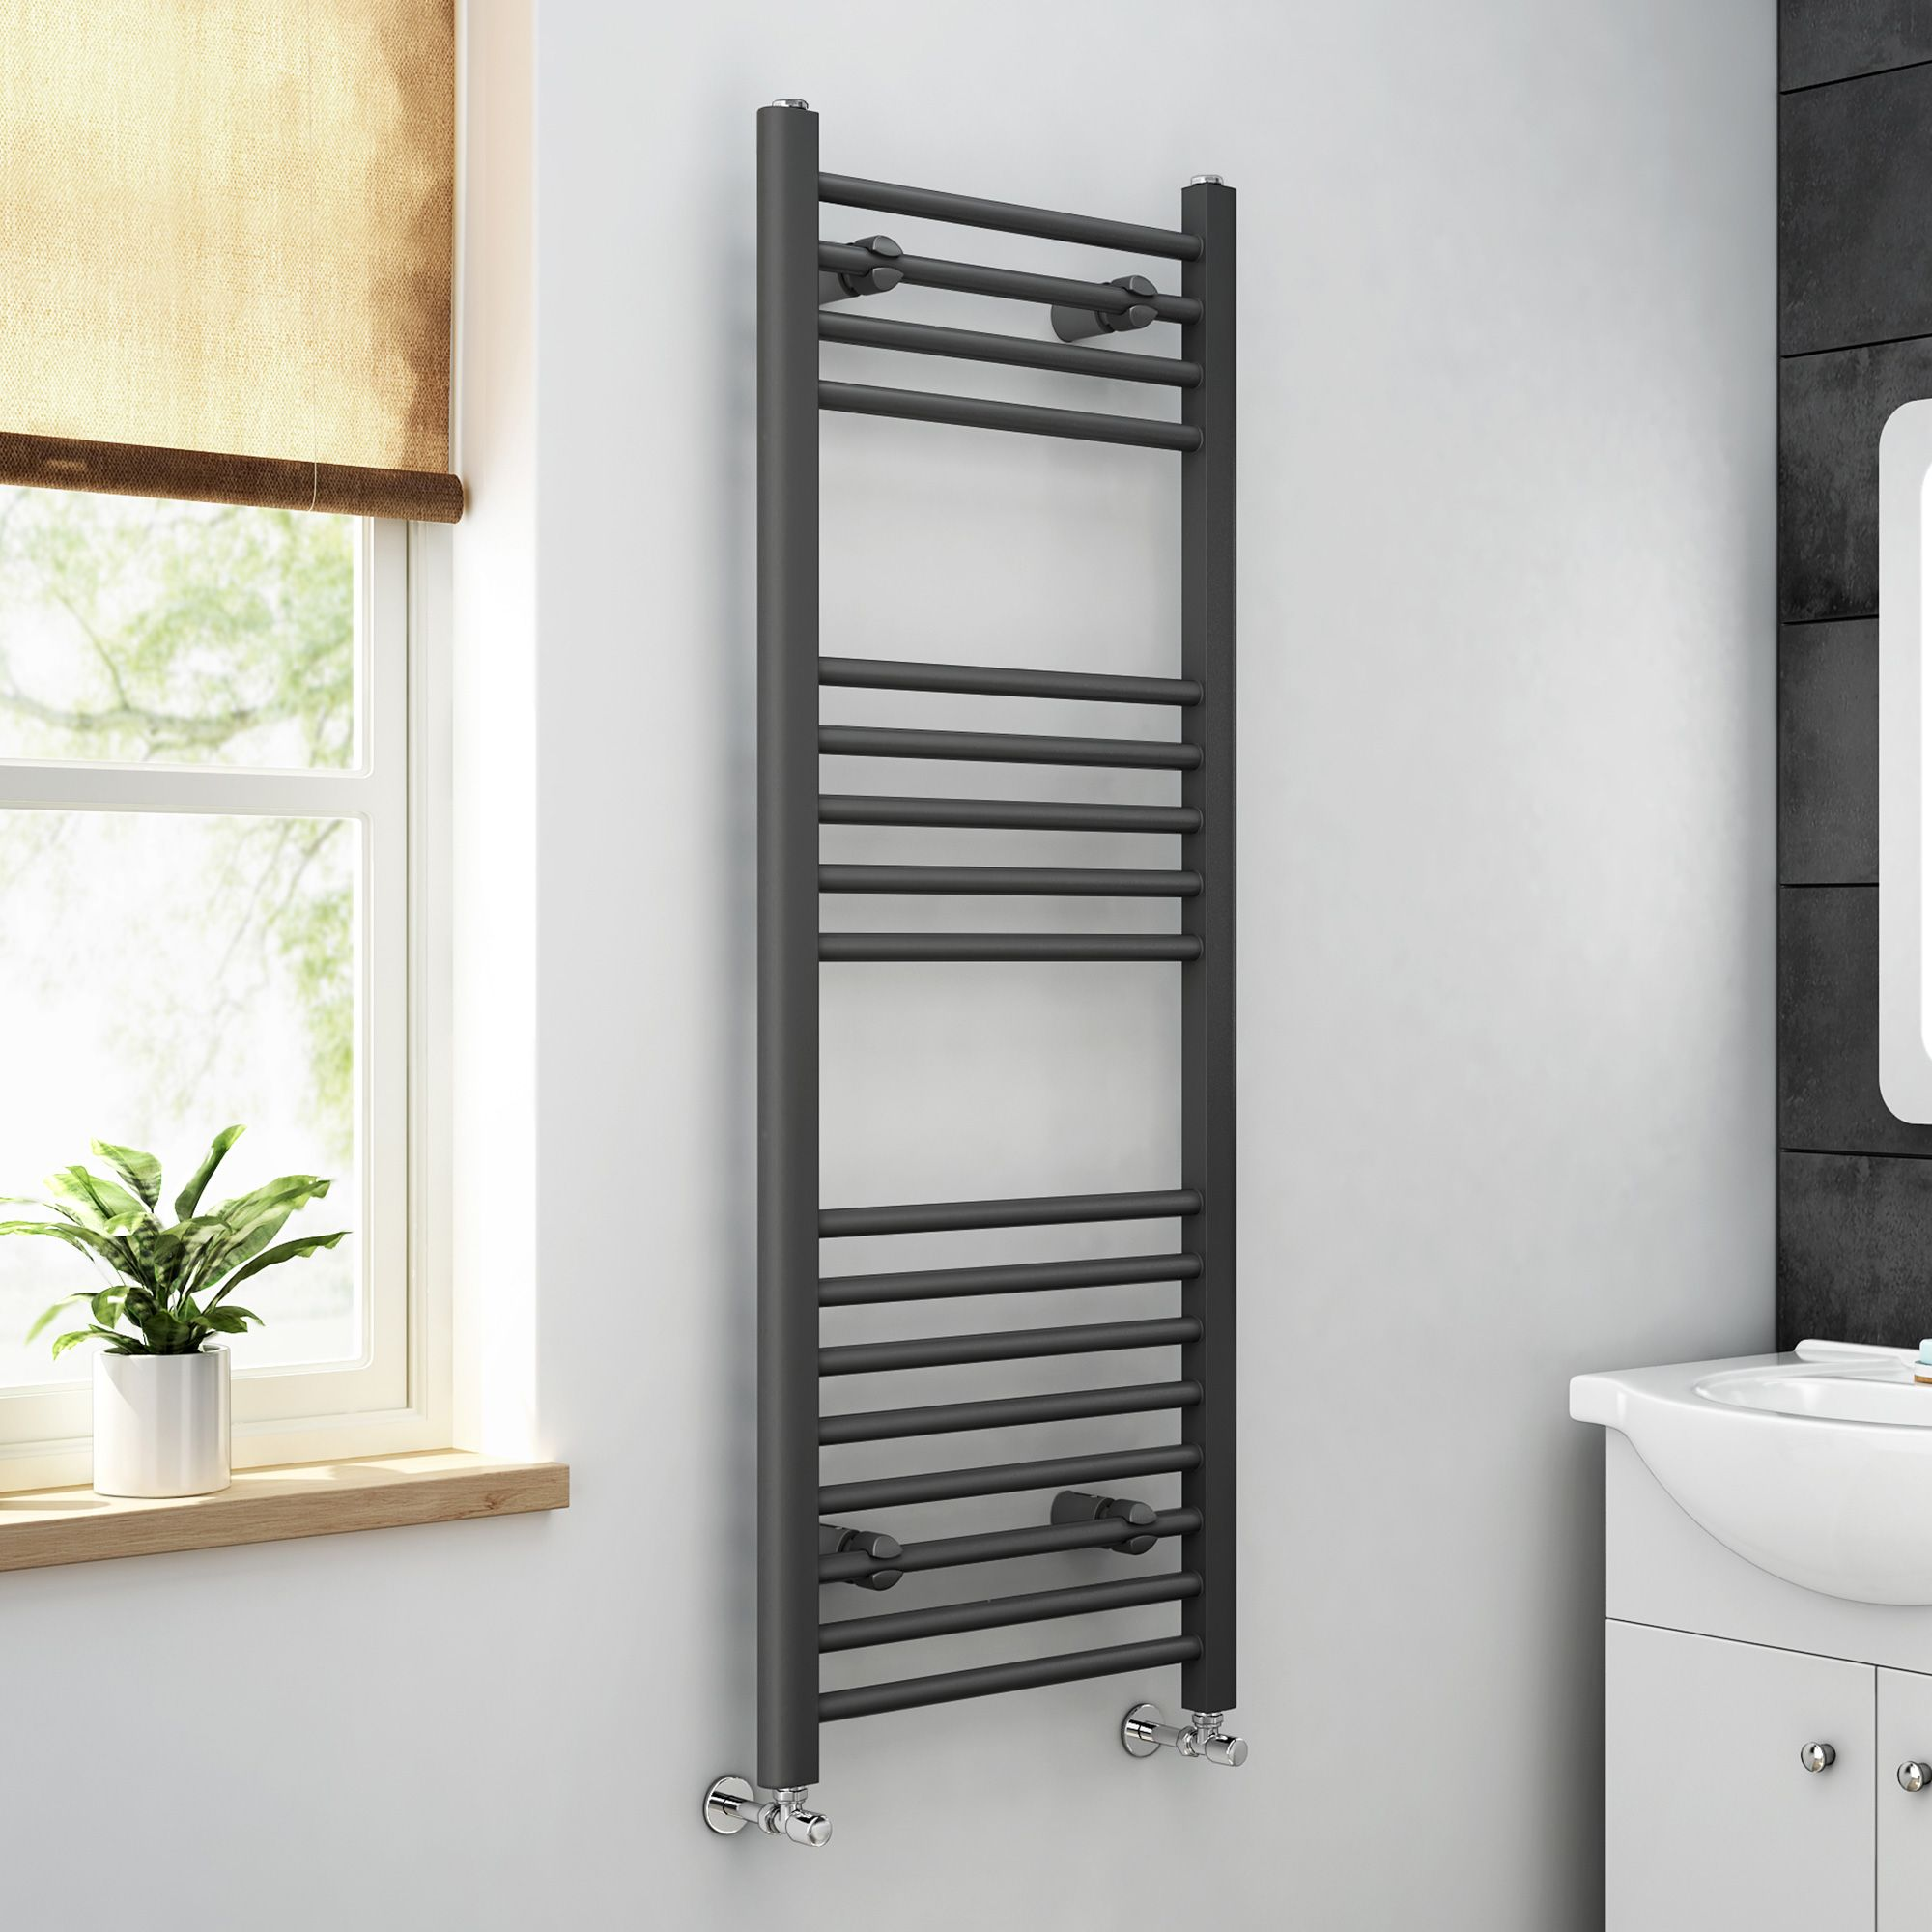 Natasha ladder rail straight modern electric towel radiator in chrome - 1200x450mm Anthracite Heated Straight Rail Ladder Towel Radiator Bathempire